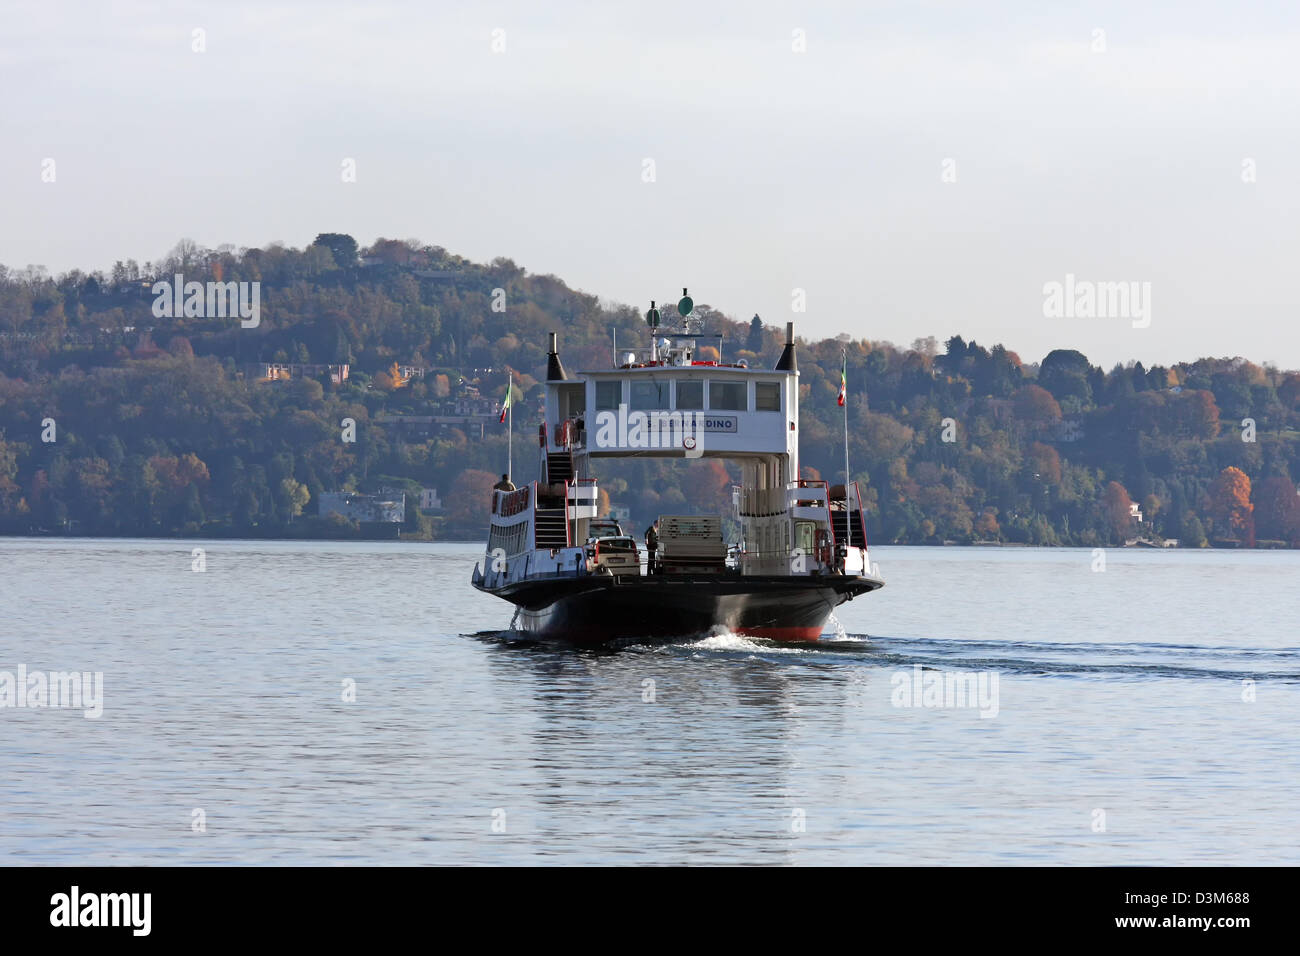 Italy, Lake Maggiore, ferry boat - Stock Image